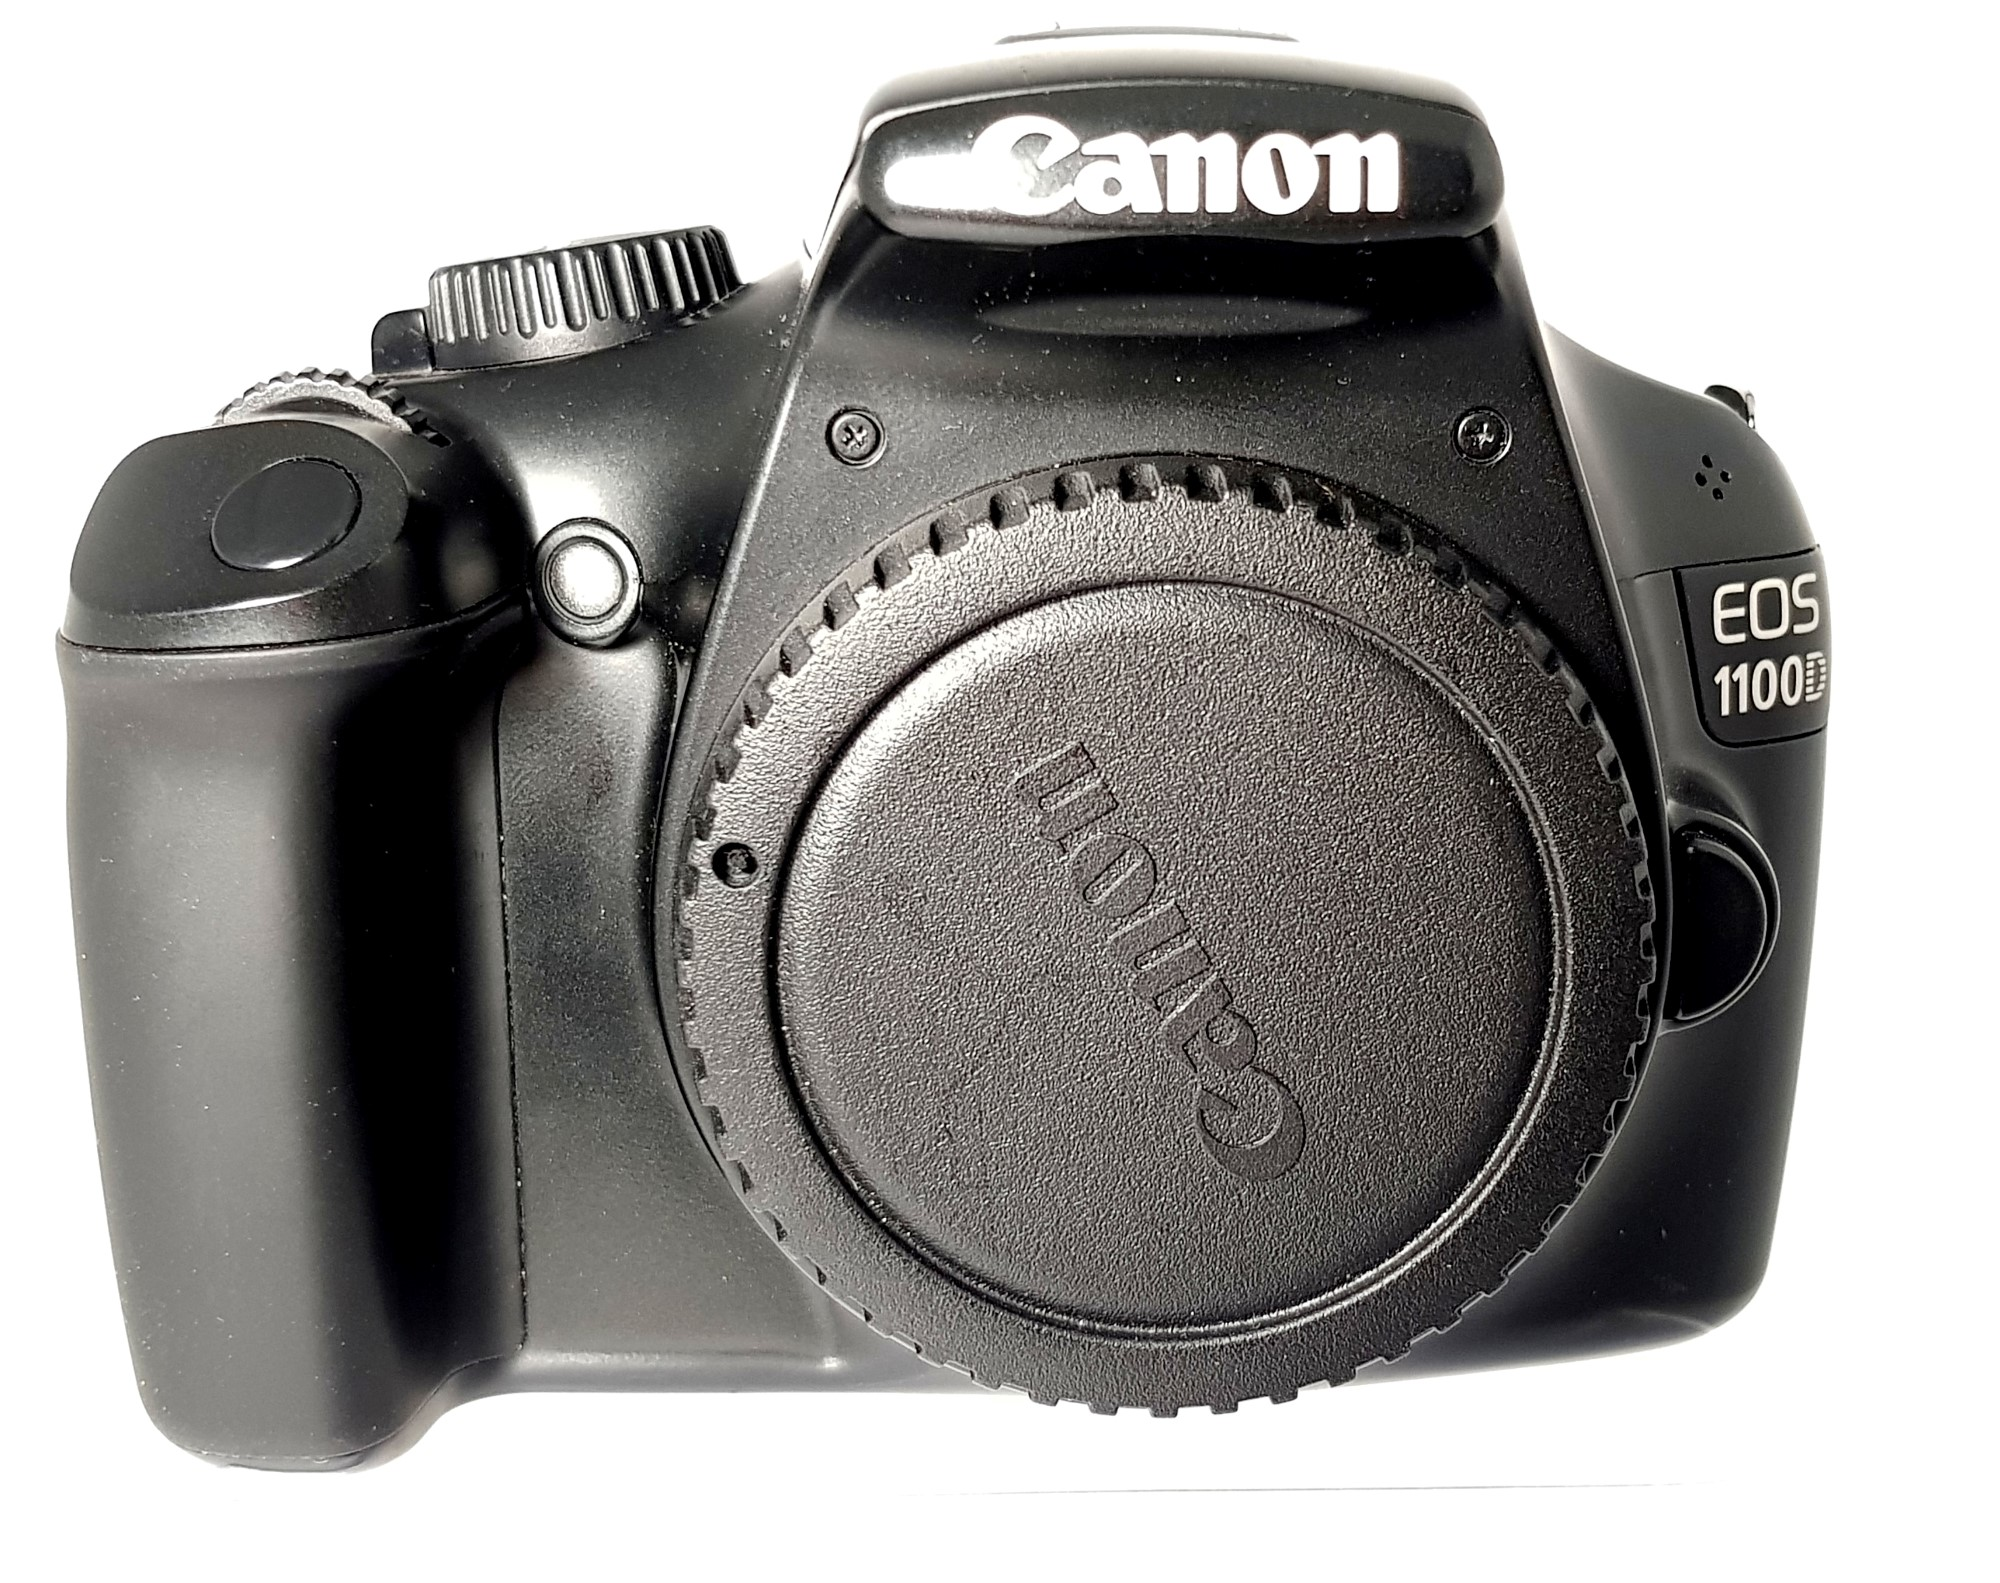 Canon Eos 1100D Black